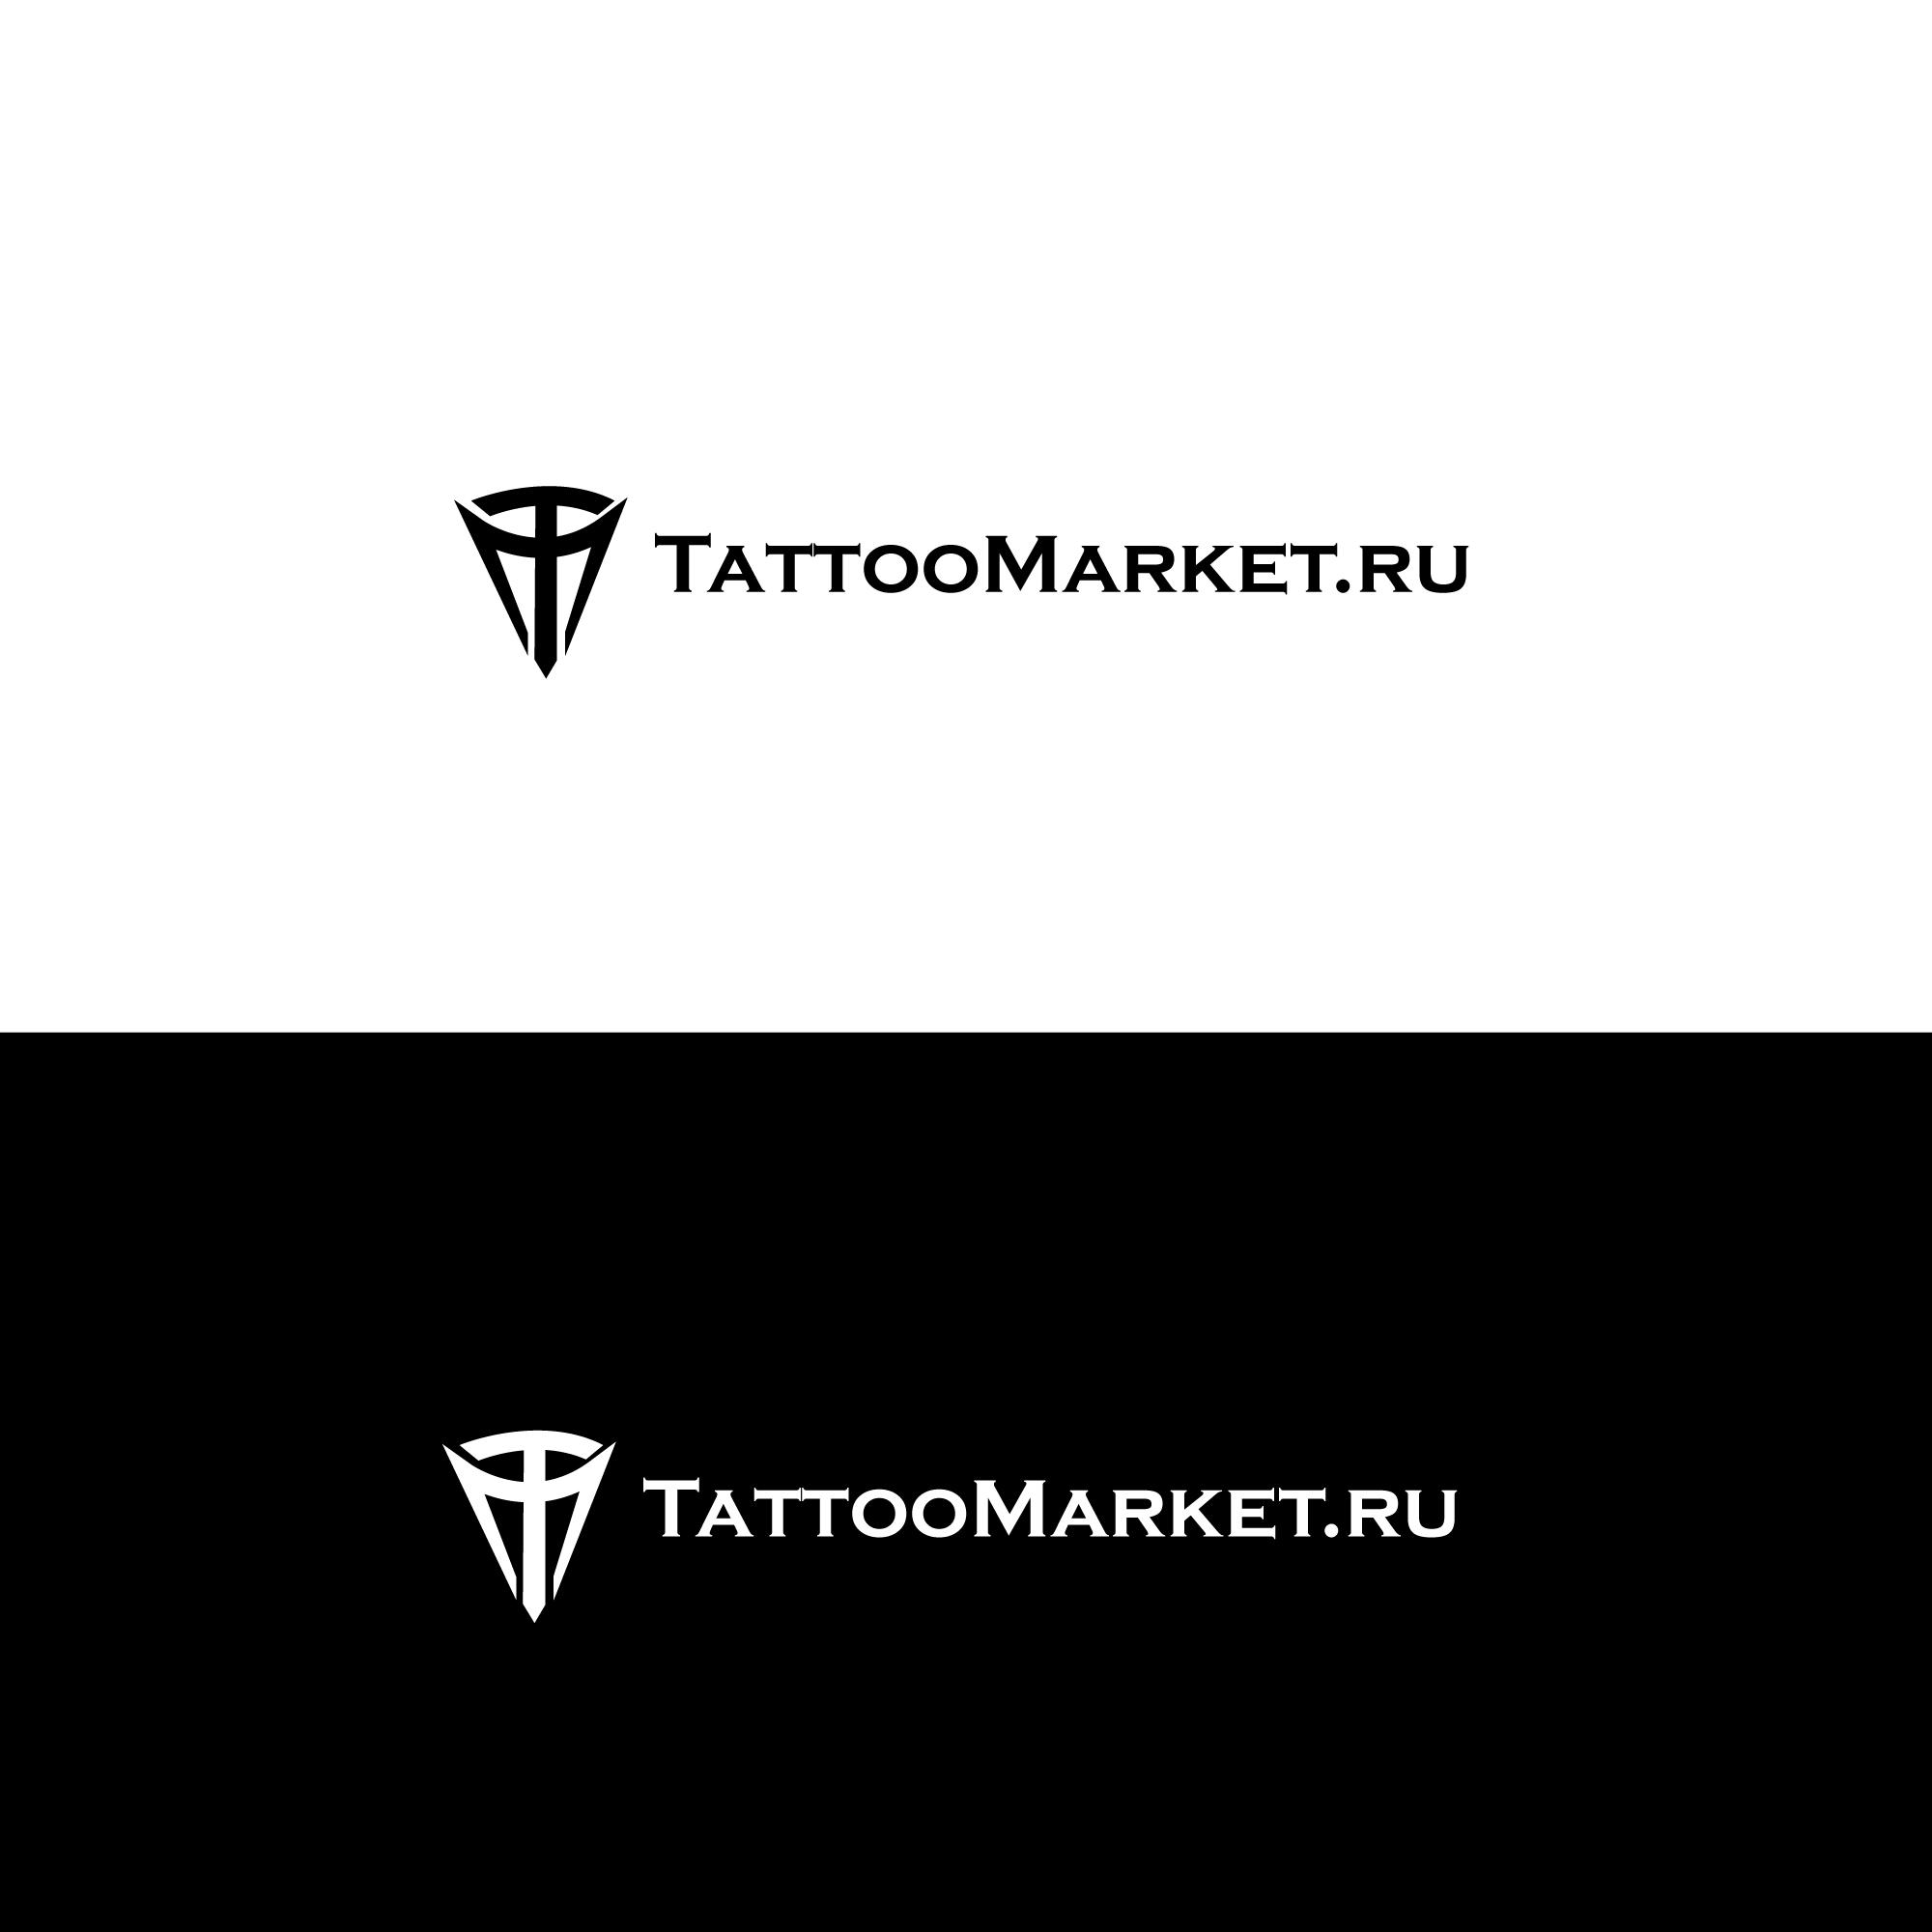 Редизайн логотипа магазина тату оборудования TattooMarket.ru фото f_7265c401c91c2bd6.jpg